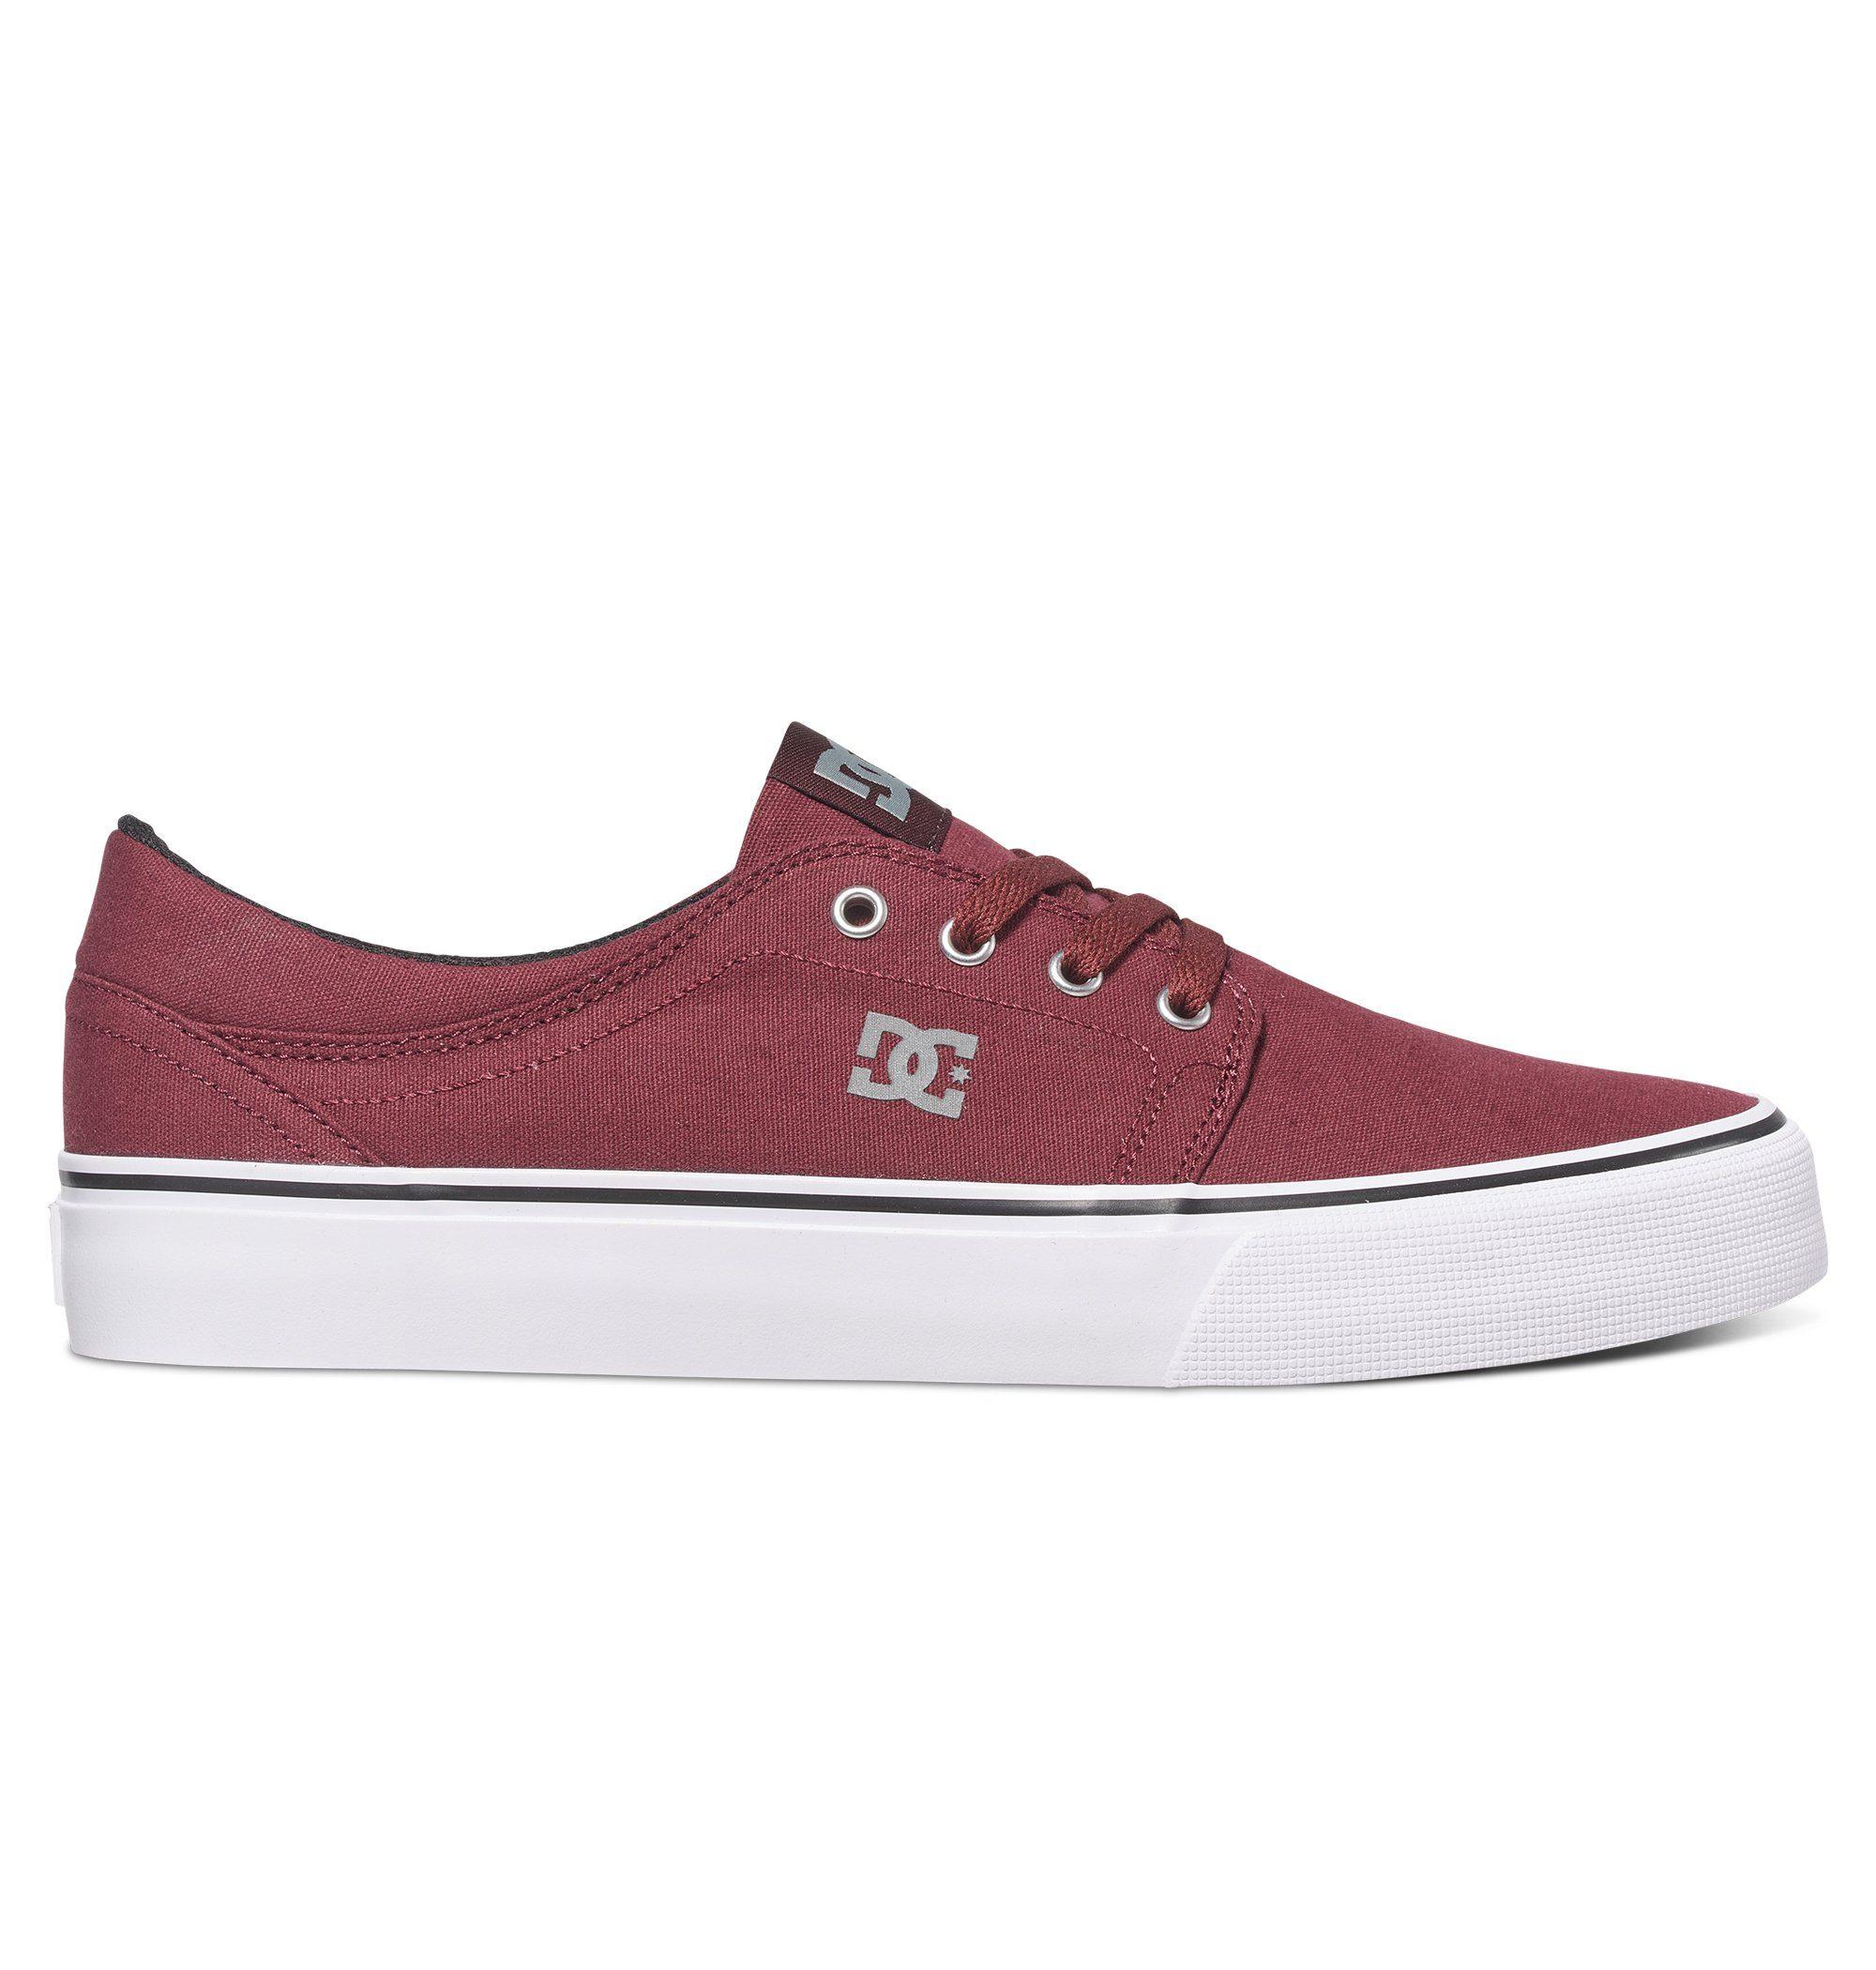 DC Shoes Schuhe Trase TX online kaufen  Ox blood